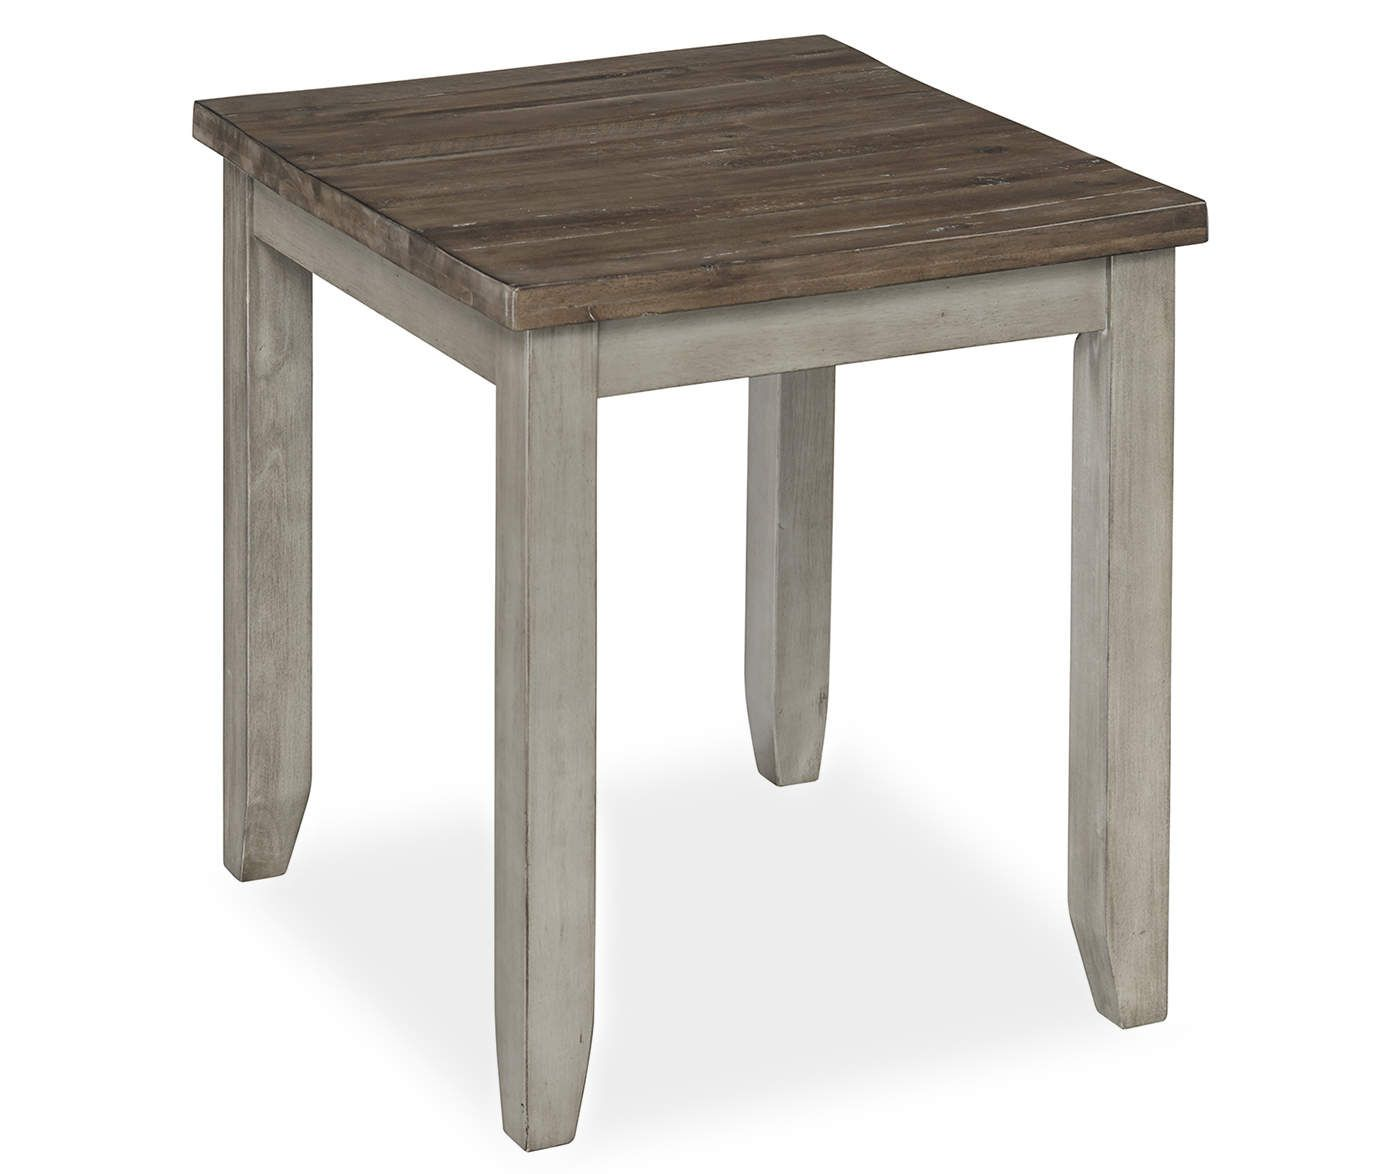 Fairhaven 3 Piece Occasional Table Set Big Lots Occasional Table Coffee Table Grey Set Decor [ 1174 x 1400 Pixel ]